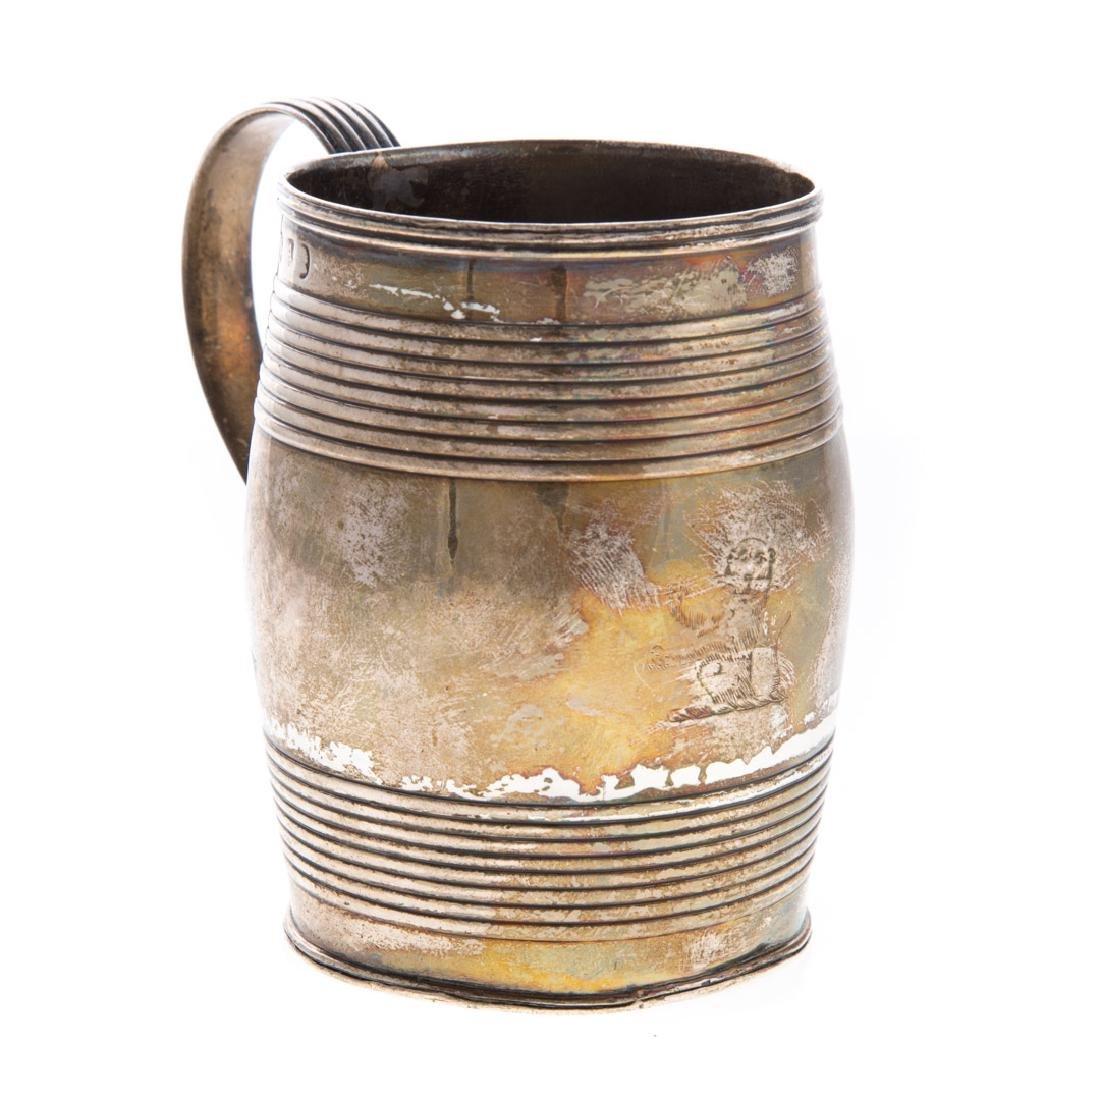 George III silver cann